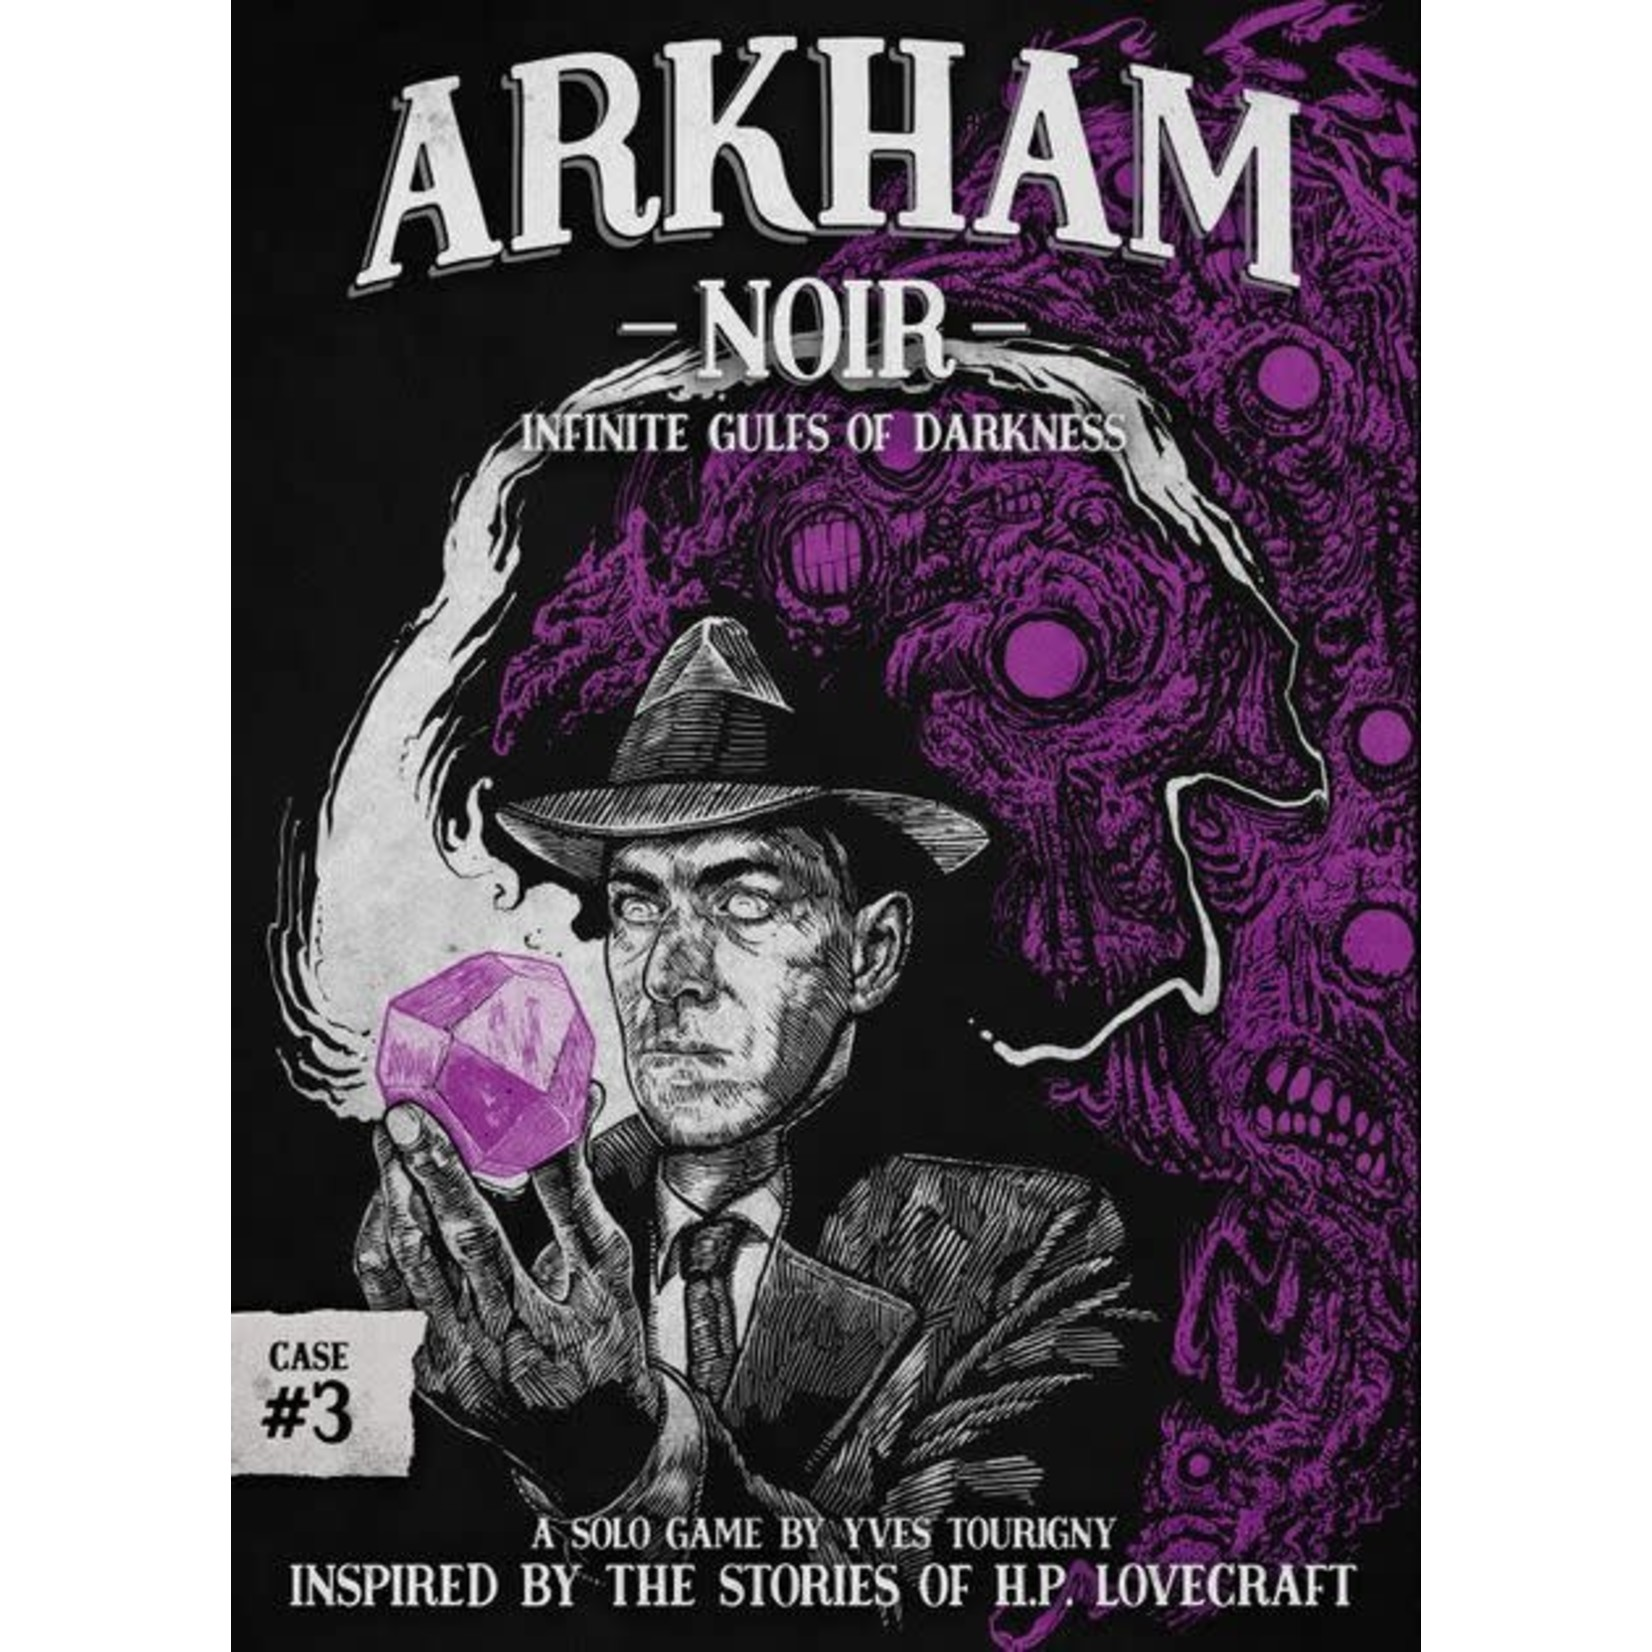 Asmodee Editions Arkham Noir: Case #3 - Infinite Gulfs of Darkness